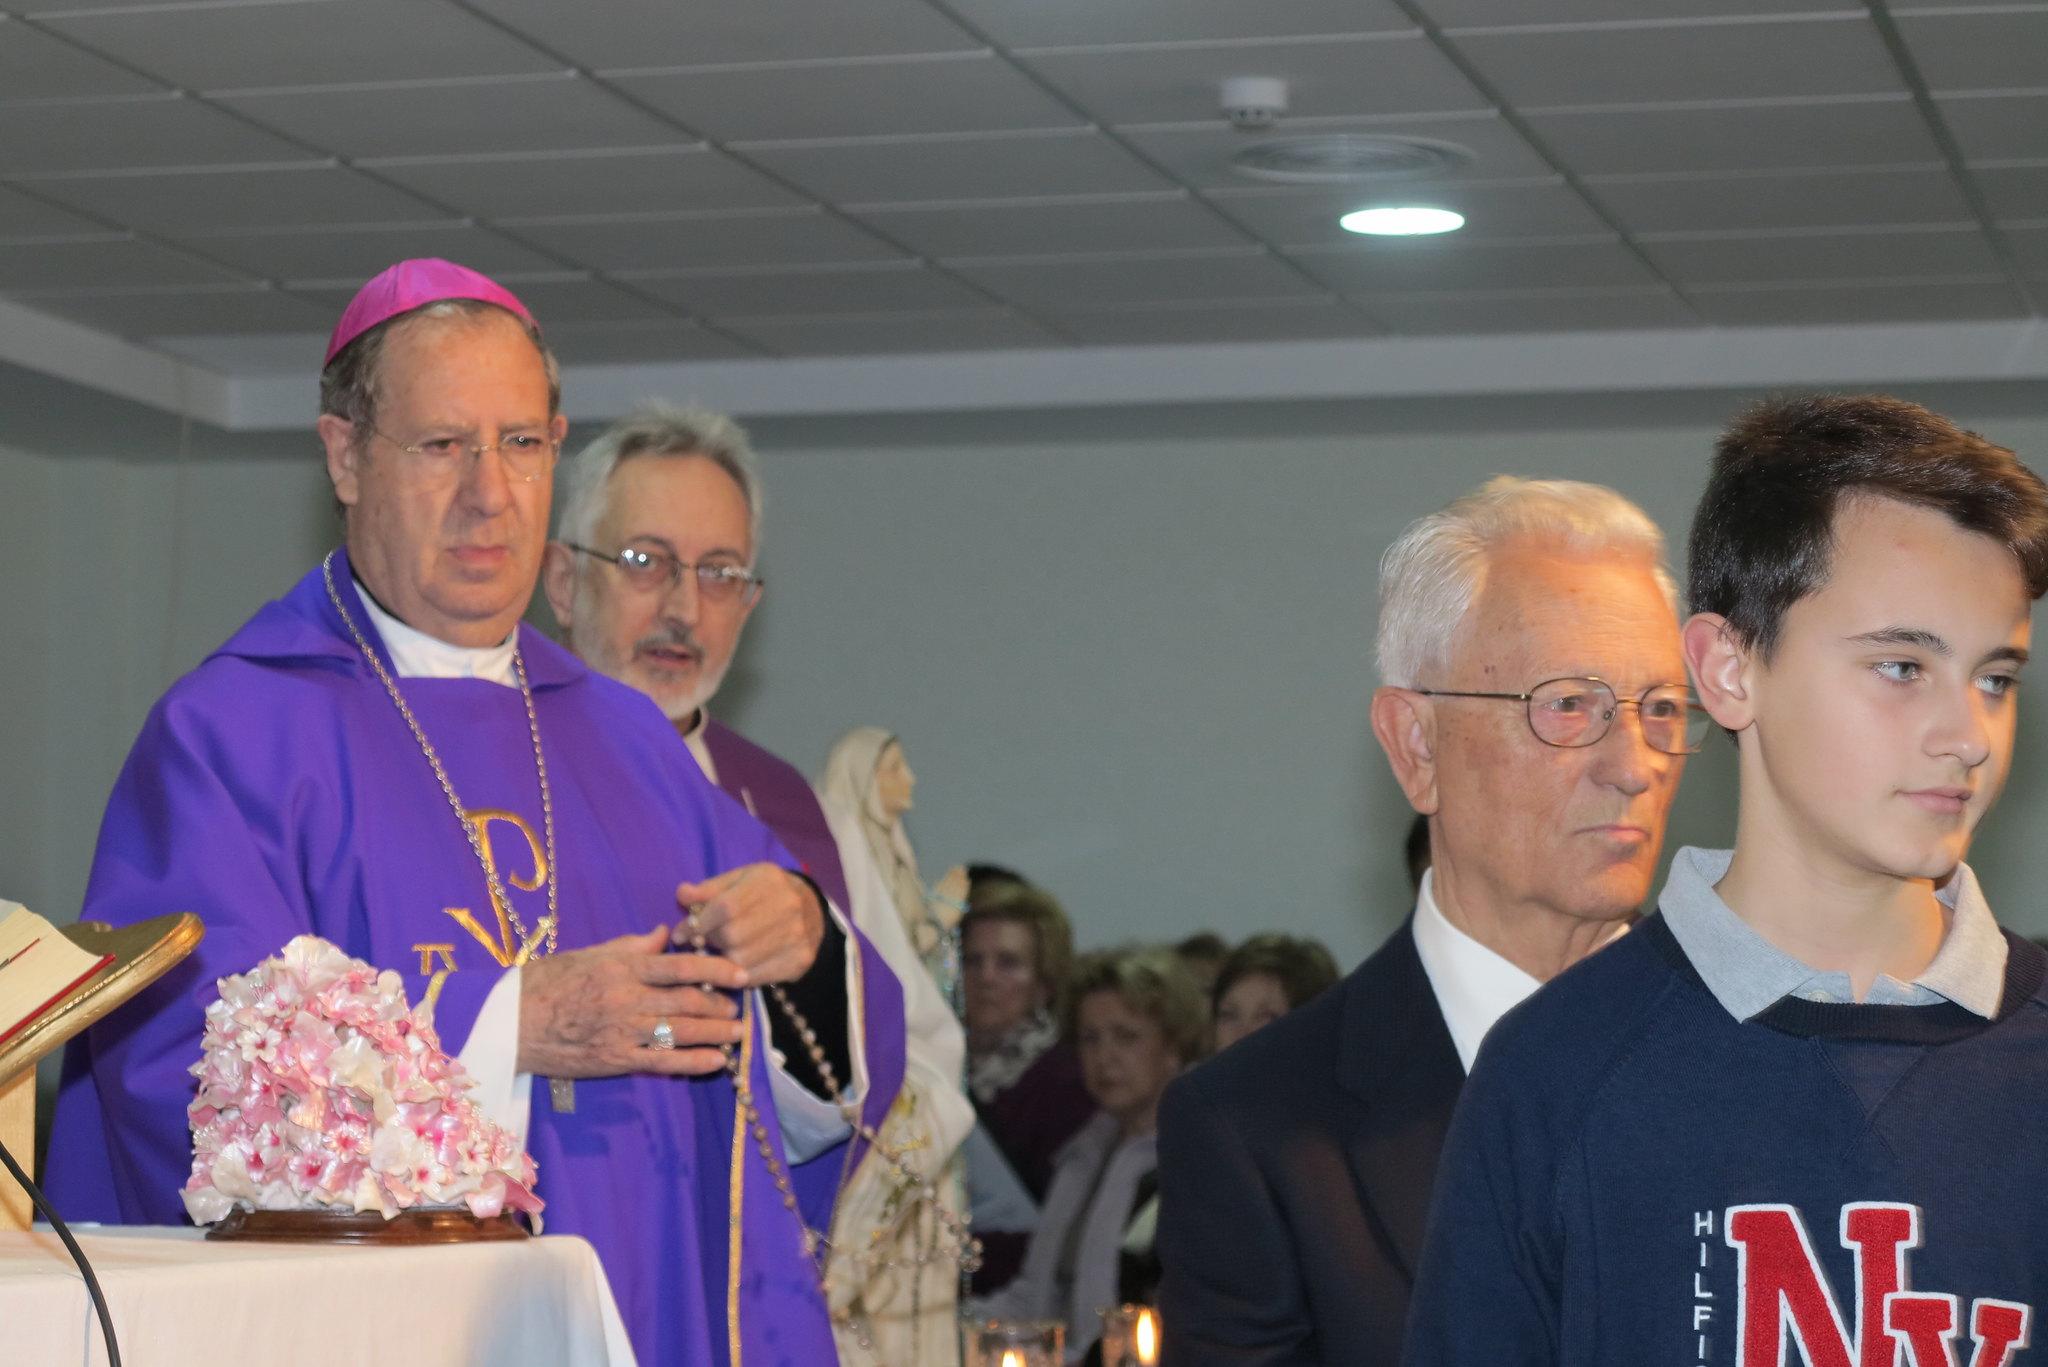 (2016-02-13) - Inauguración Virgen de Lourdes, La Molineta - Archivo La Molineta 2 (26)